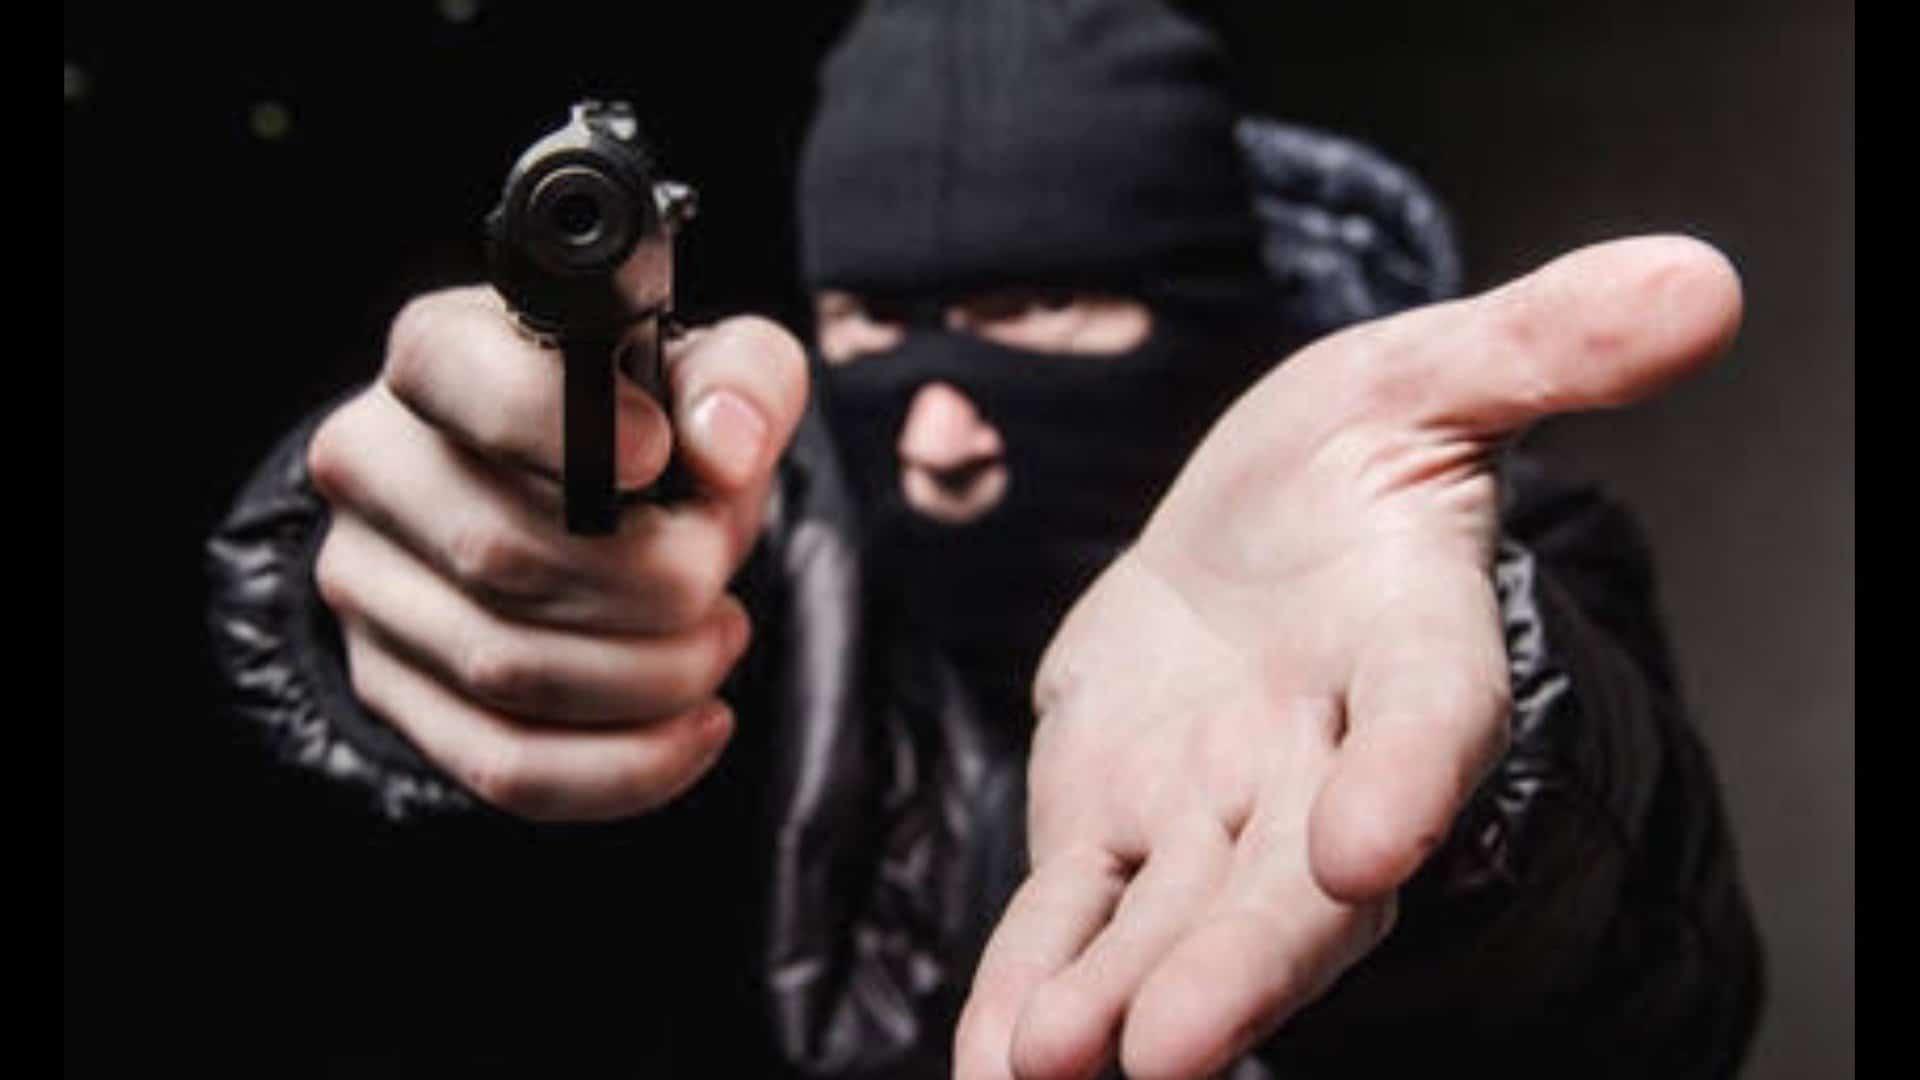 Armed Home Burglaries